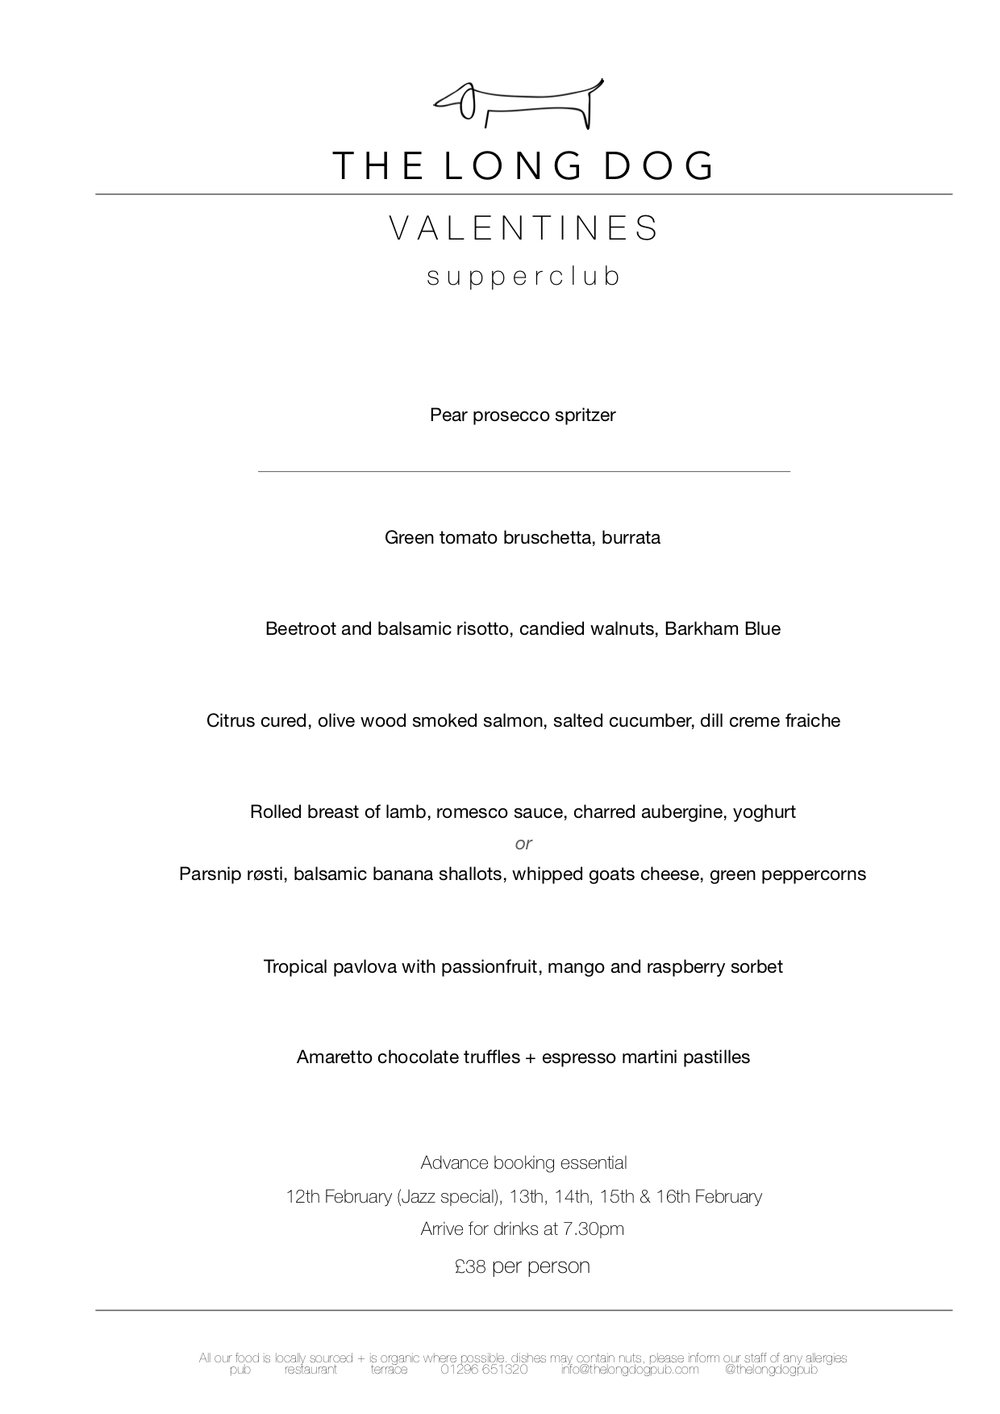 Valentines supperclub.jpg